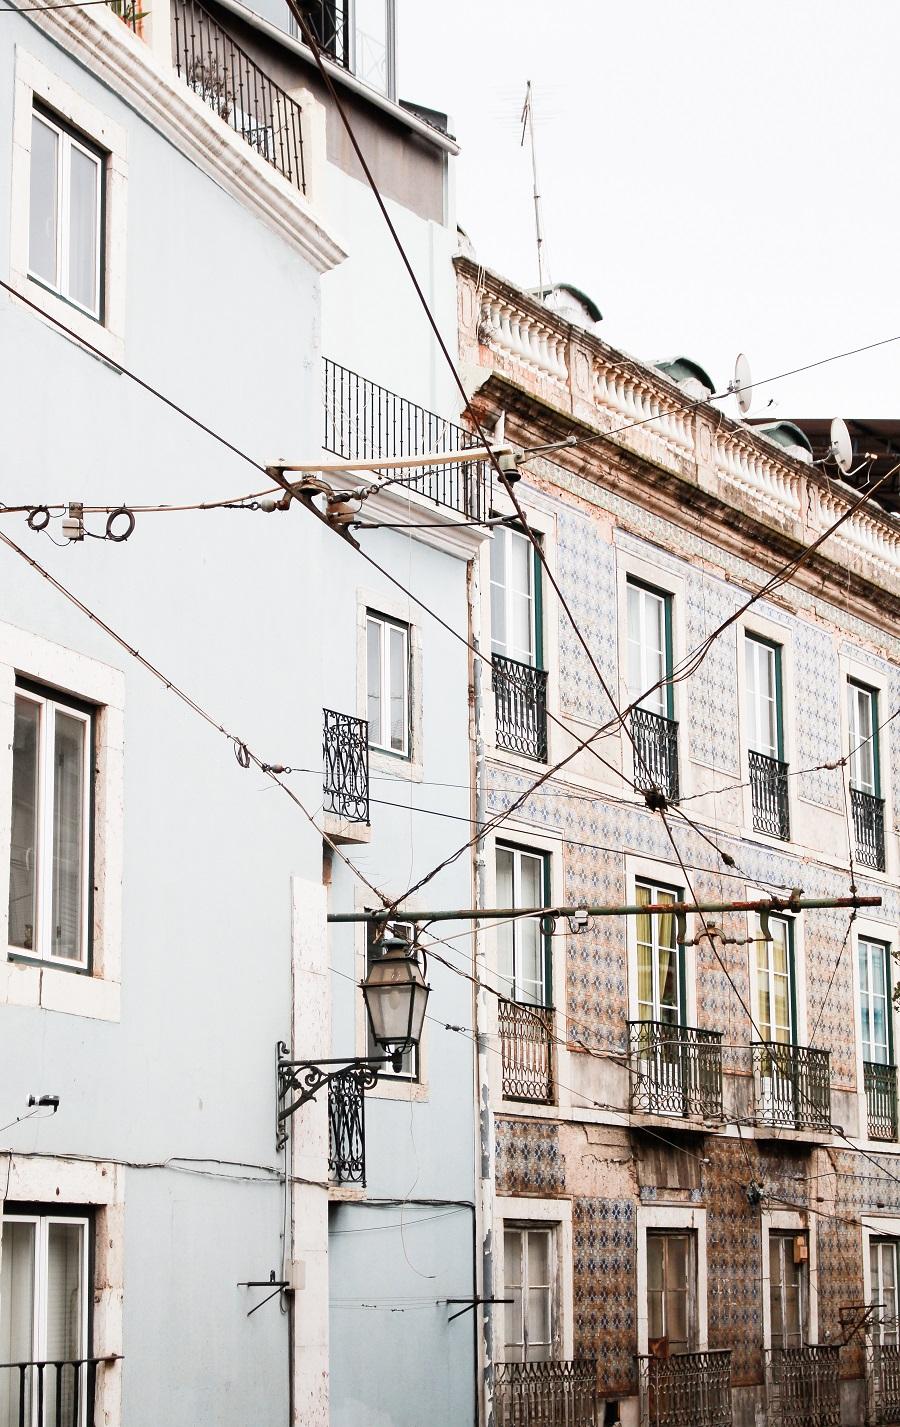 10_15_Lisboa_Viajar_Inspira-14_alfama.jpg